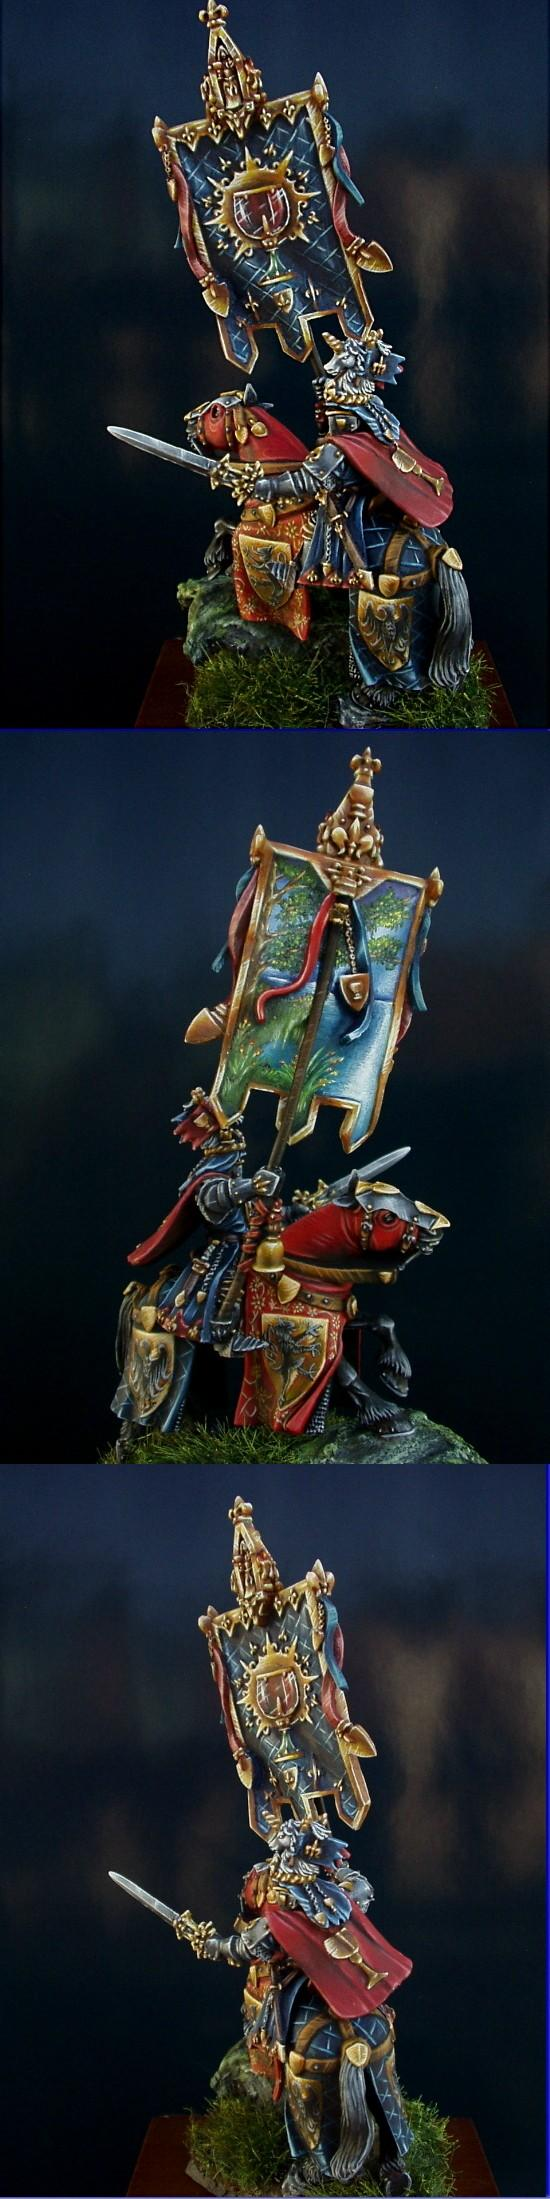 Banner, Brettonnian, Brettonnian Knight, Grail Knight, Horse, Knights